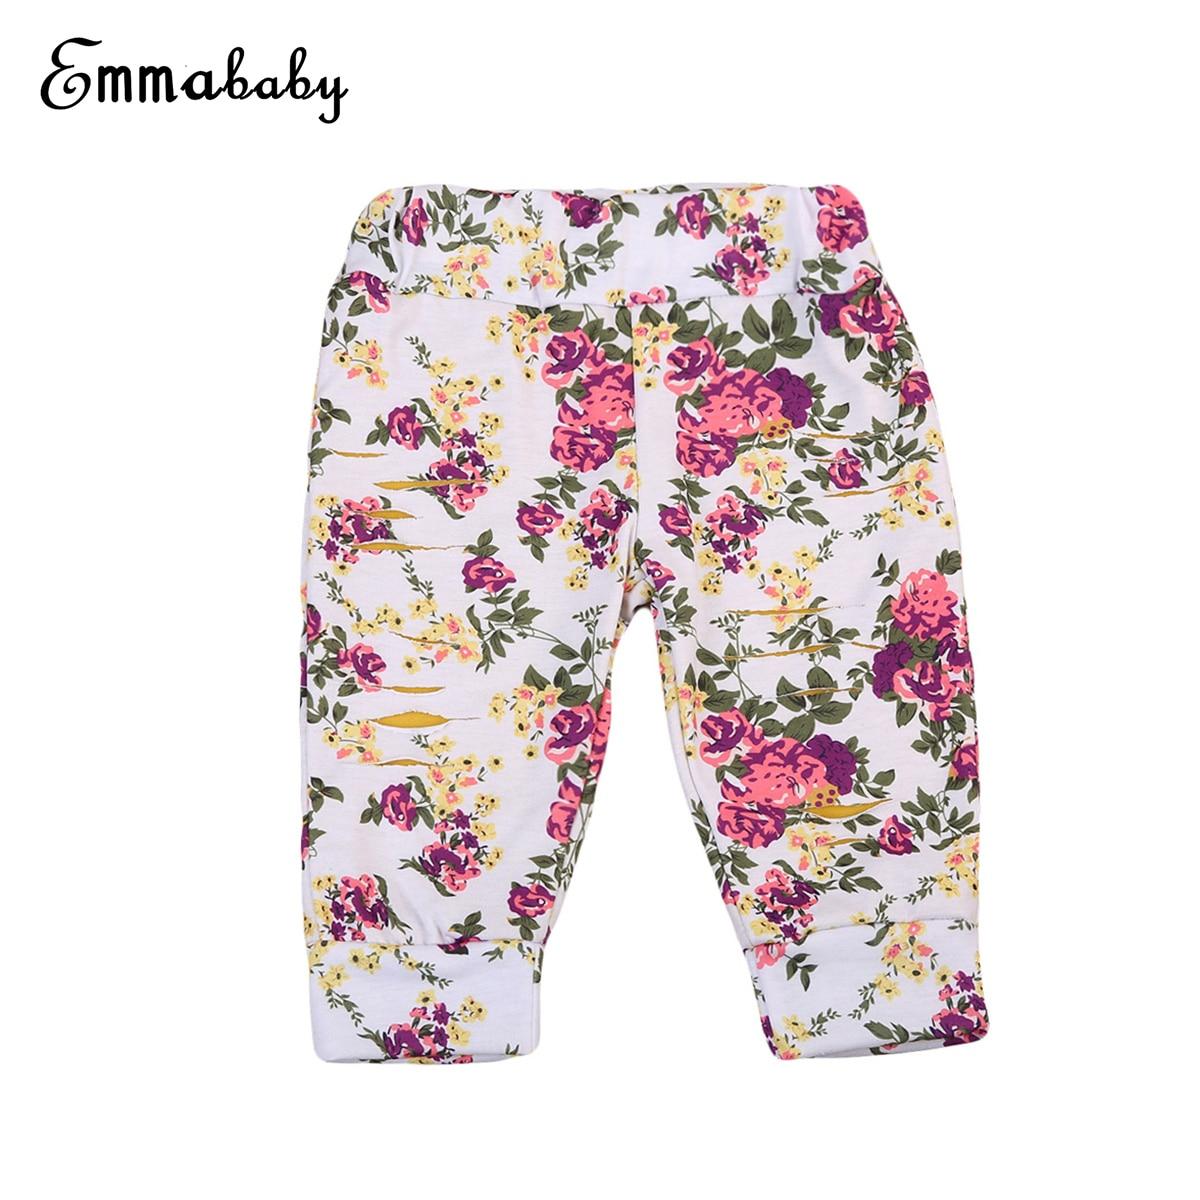 2017 Babys Mädchen Kleidung Kleinkind Kinder Baby Mädchen Floral Gedruckt Haremshose Hosen Leggings Kleidung